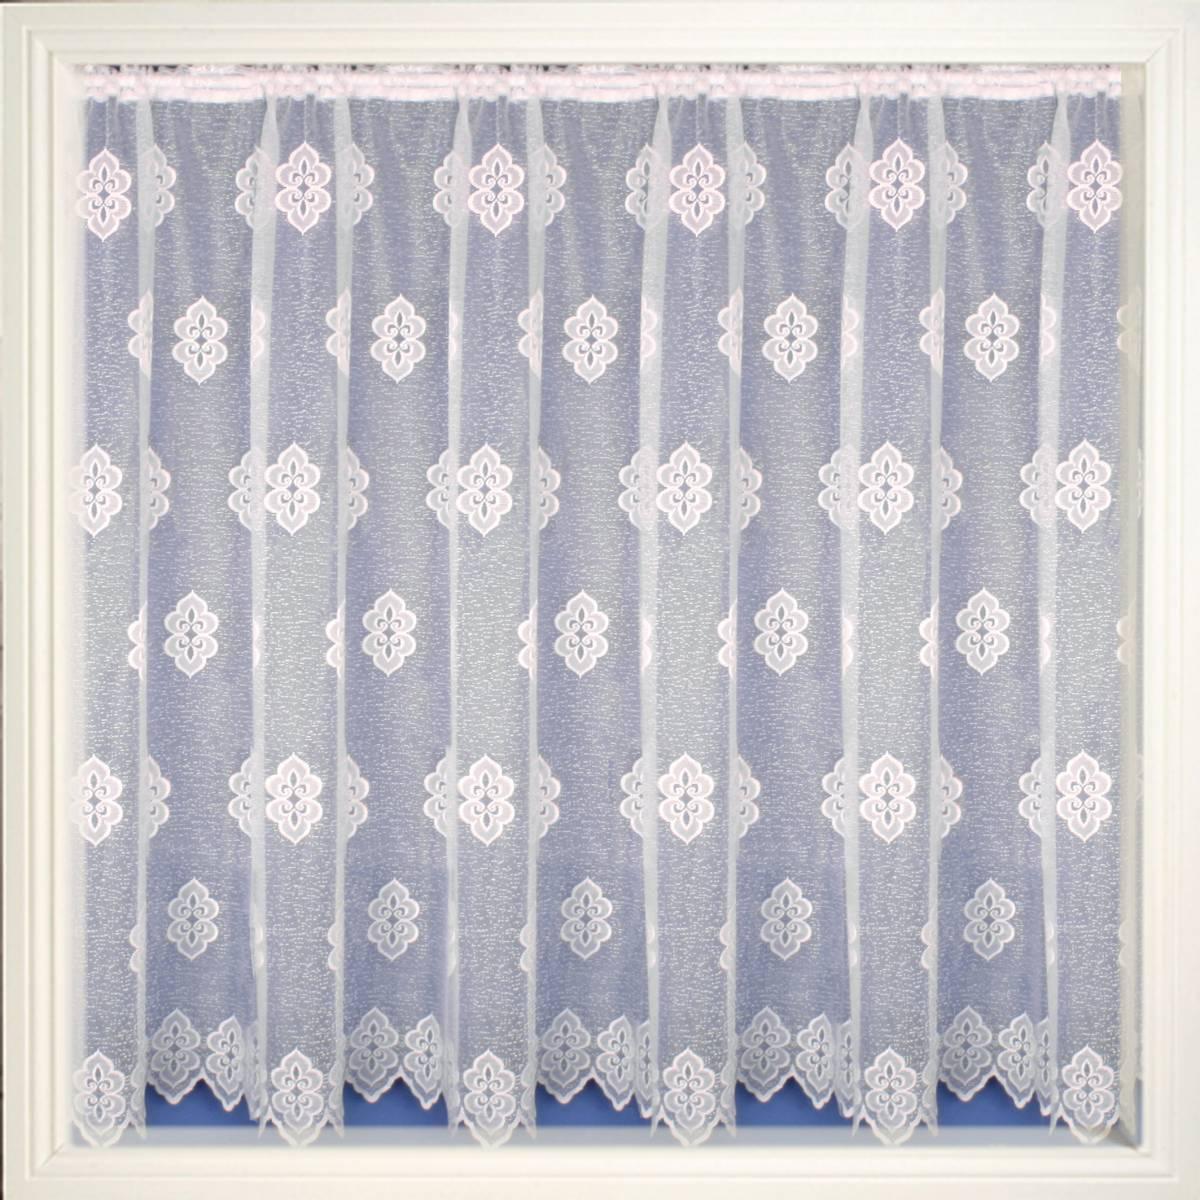 tunisia white net curtain net curtain 2 curtains. Black Bedroom Furniture Sets. Home Design Ideas